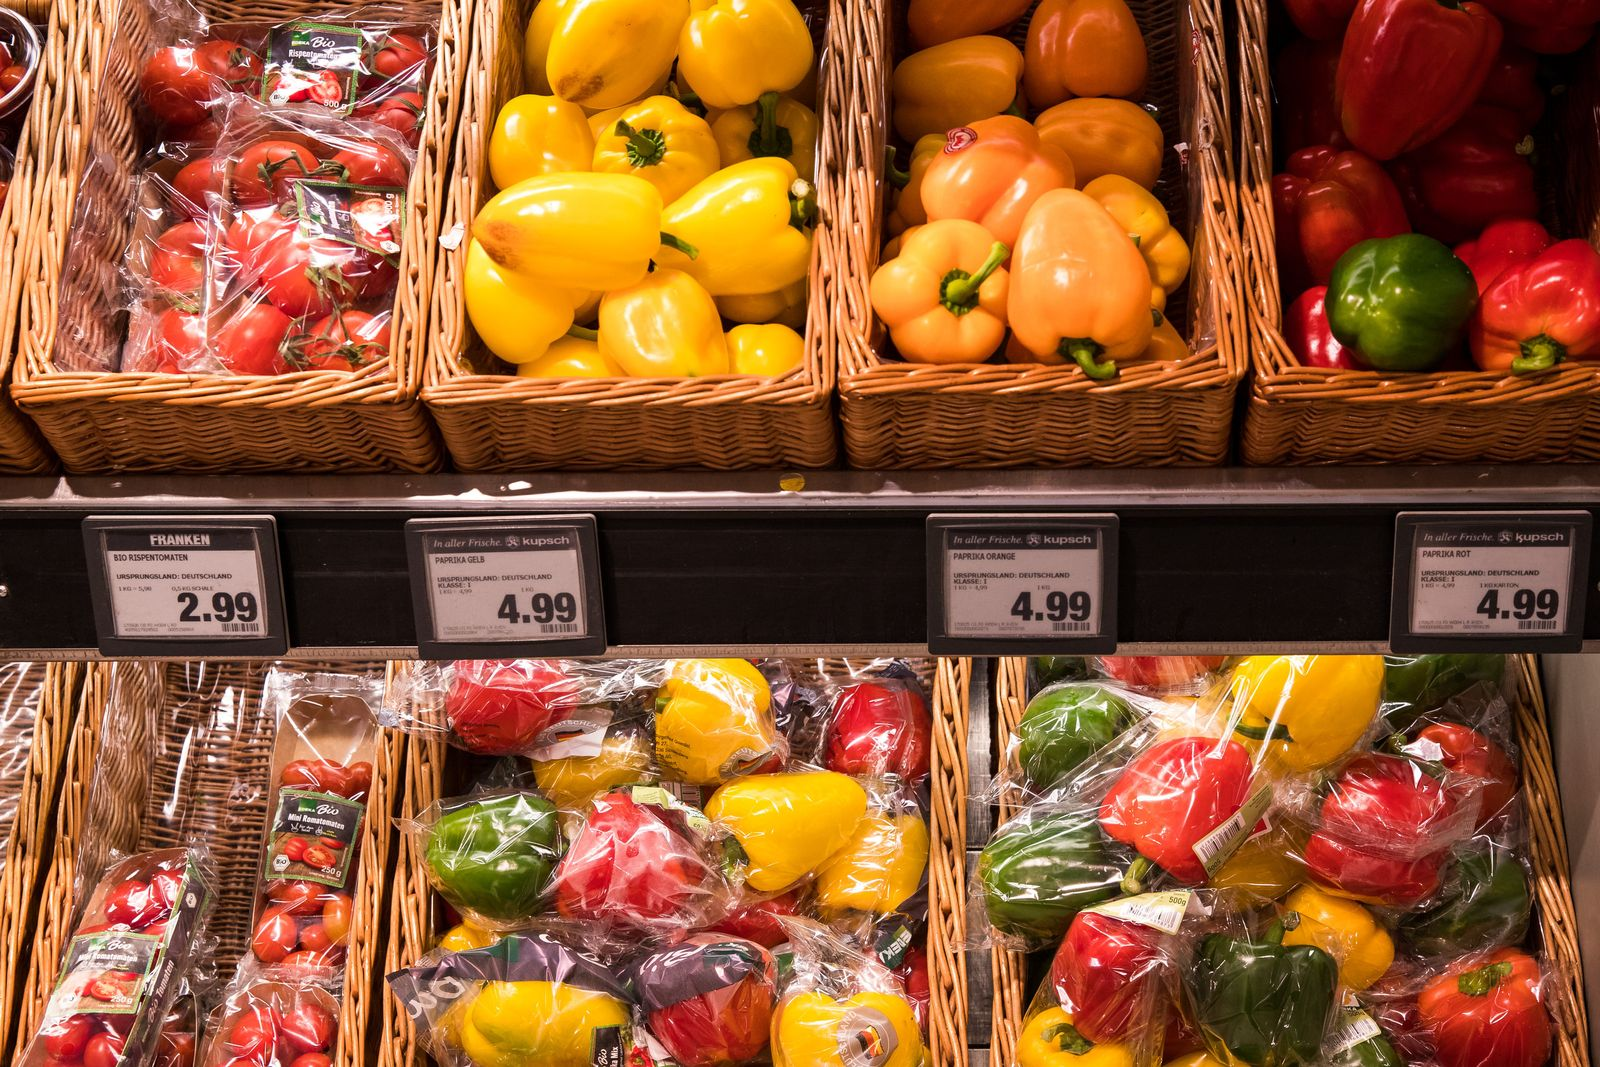 Verpacktes und loses Gemüse